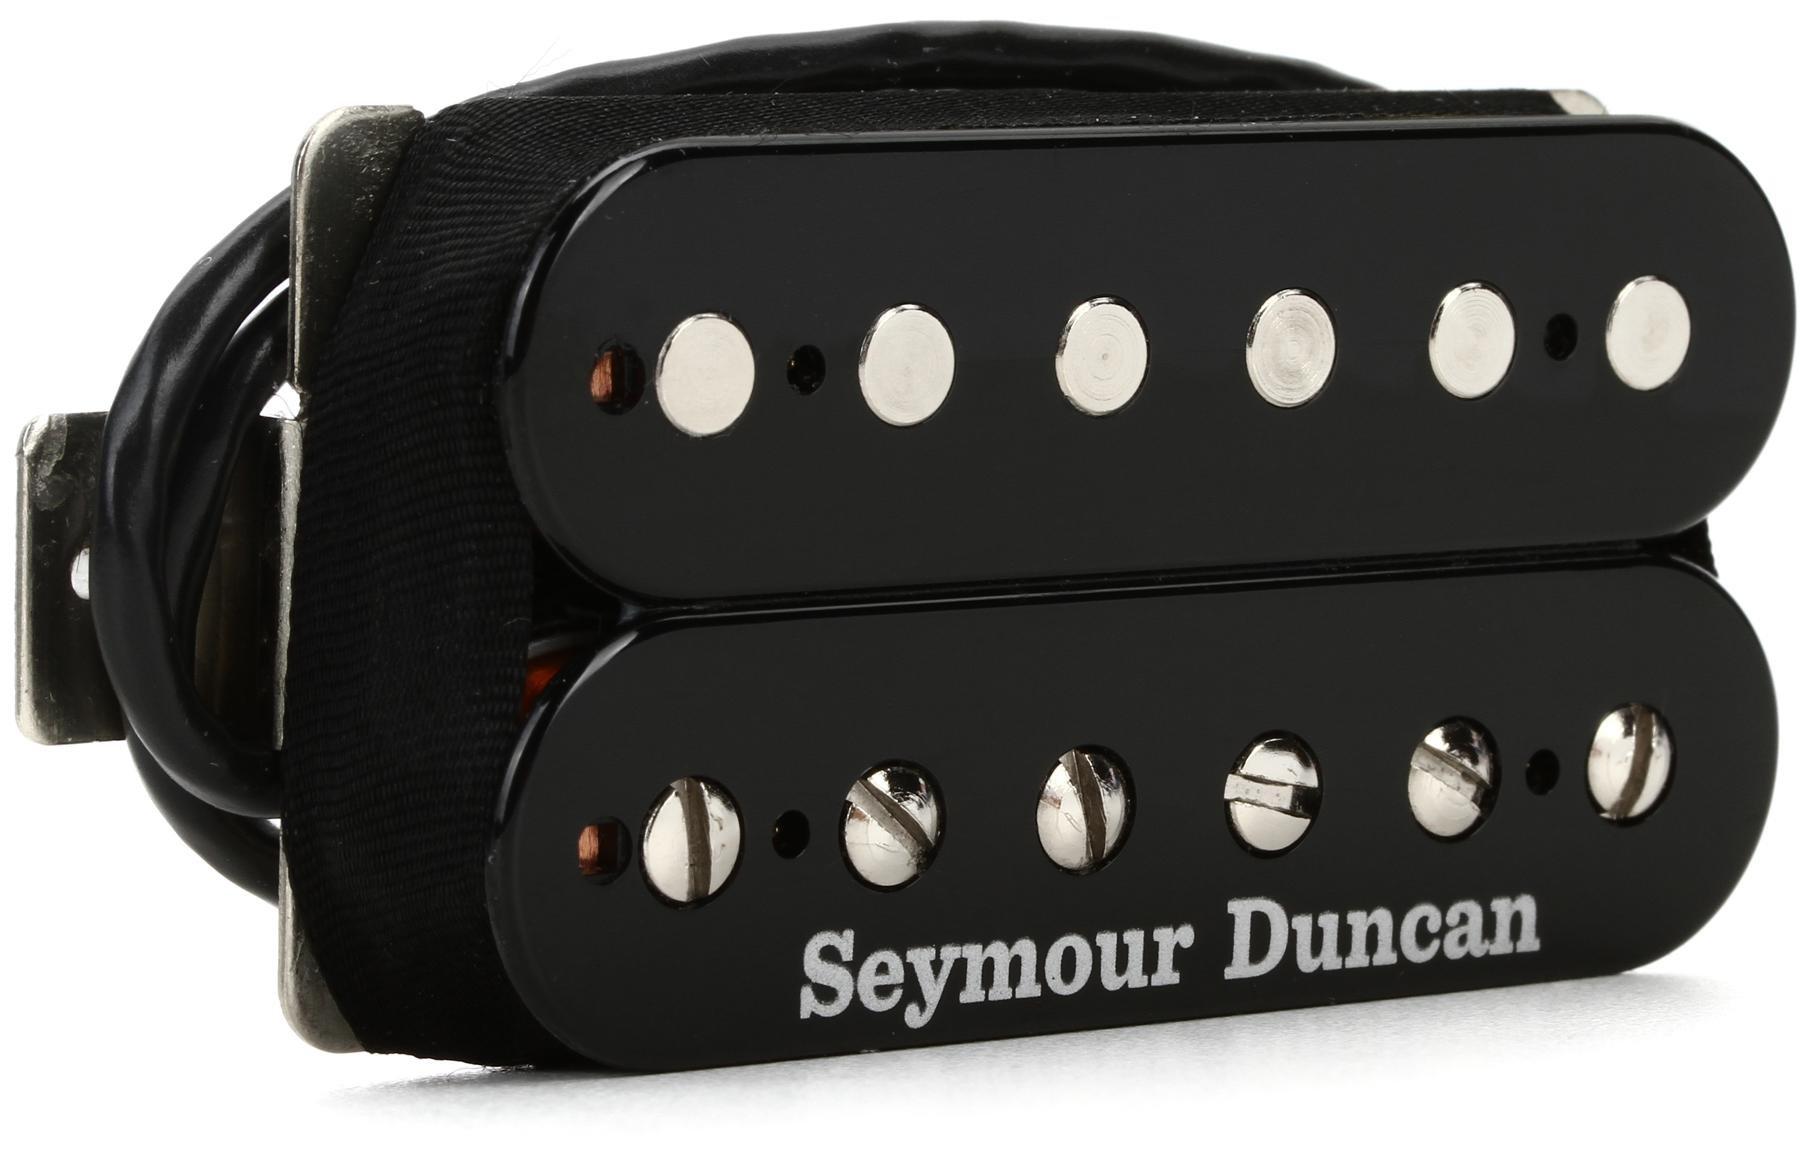 Seymour Duncan SH-5 Duncan Custom Humbucker Pickup - Black   Sweetwater